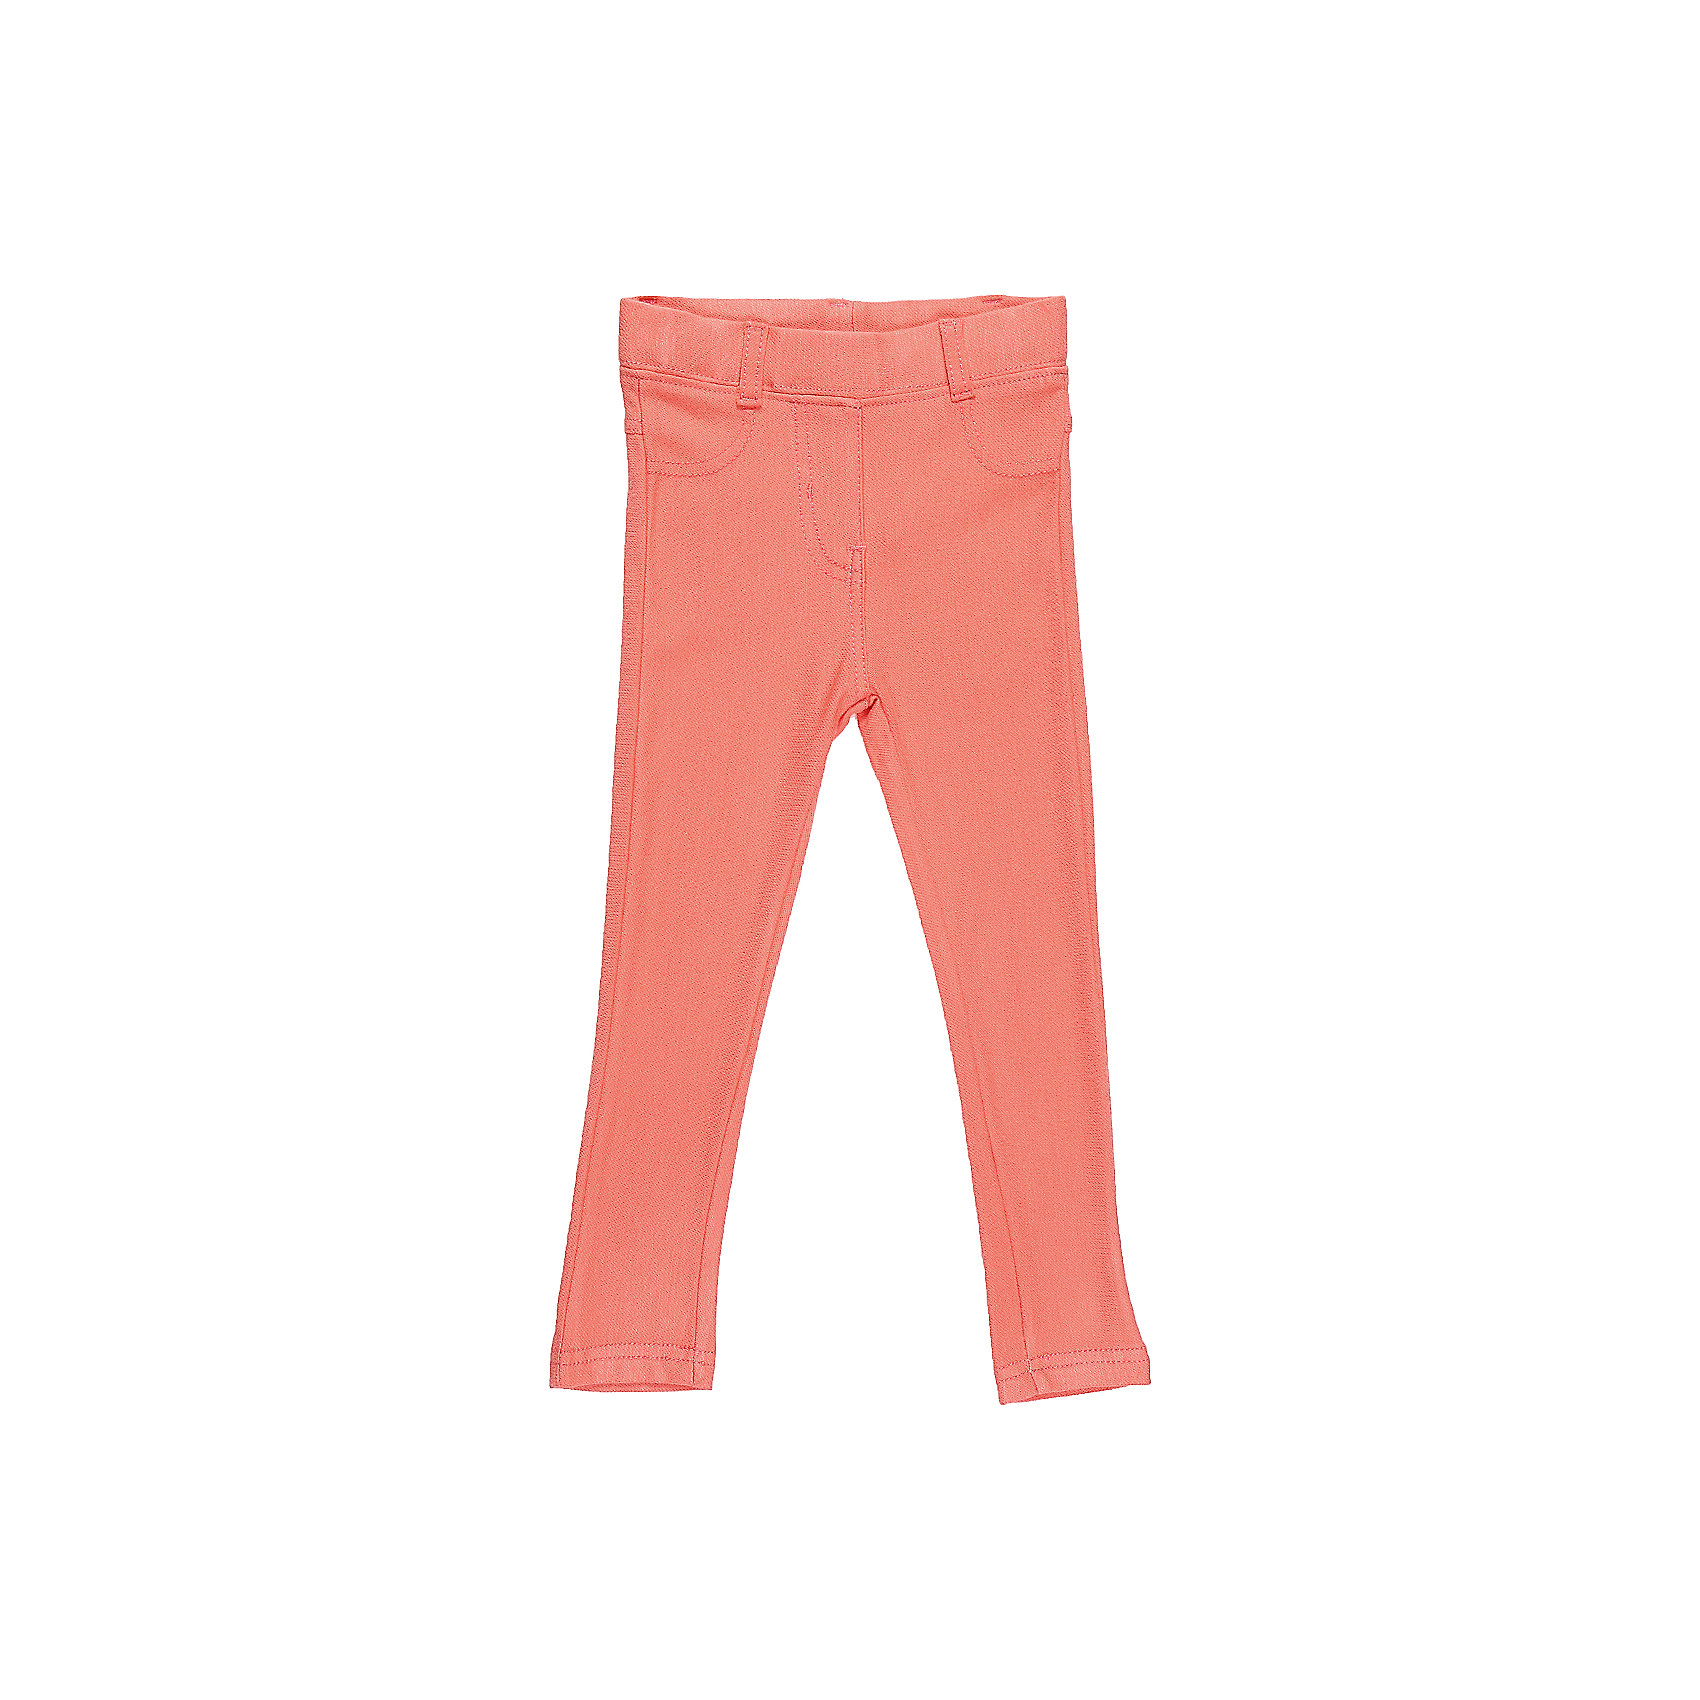 Леггинсы для девочки Sweet BerryТрикотажные брюки-джеггинсыдля девочки. Модель зауженного кроя. Два накладных кармана сзади.<br>Состав:<br>95%хлопок 5%эластан<br><br>Ширина мм: 123<br>Глубина мм: 10<br>Высота мм: 149<br>Вес г: 209<br>Цвет: розовый<br>Возраст от месяцев: 12<br>Возраст до месяцев: 18<br>Пол: Женский<br>Возраст: Детский<br>Размер: 86,92,98,80<br>SKU: 5410904